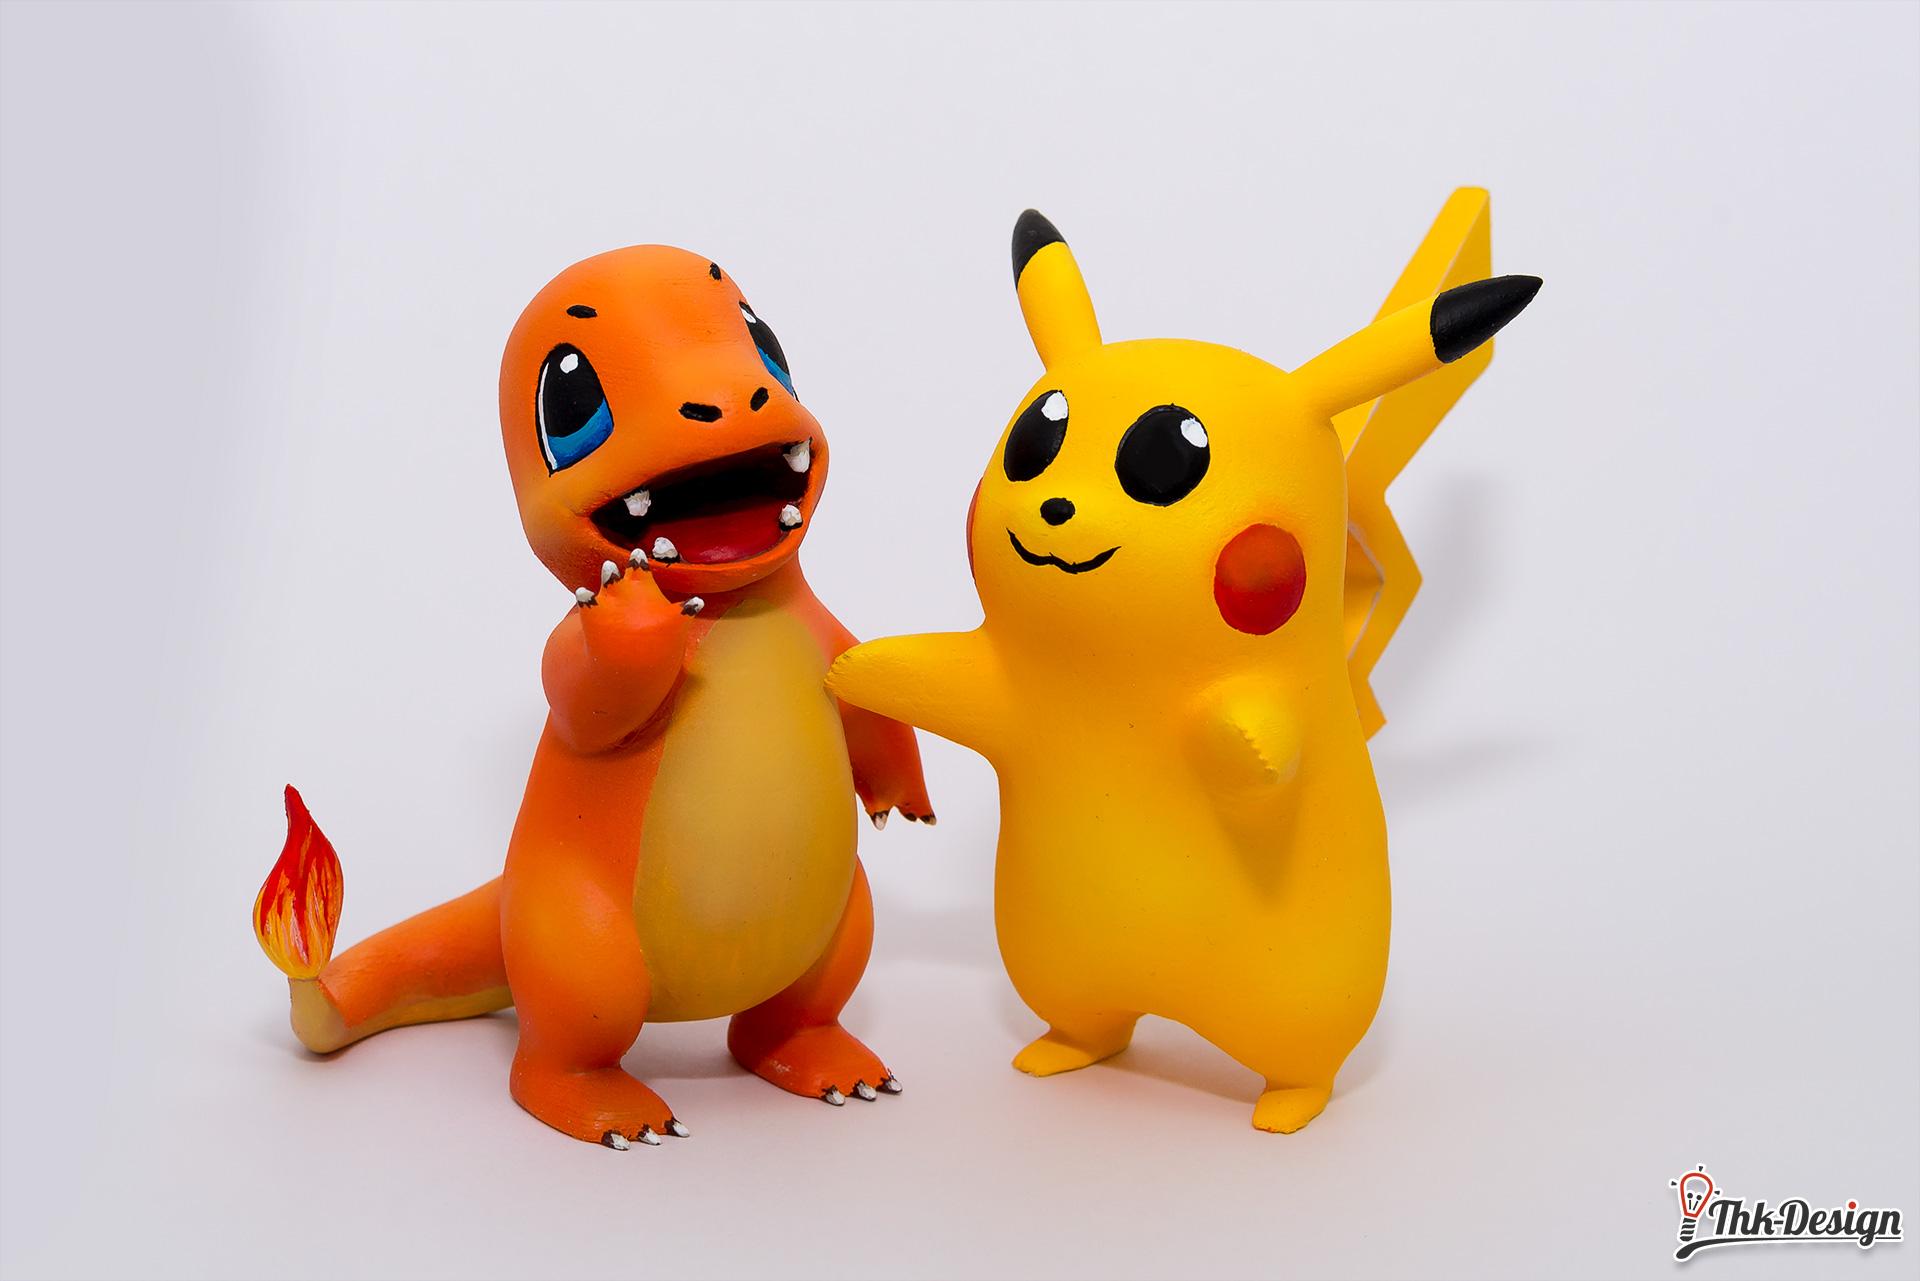 Auftragsarbeit 3D Druck Pokemons